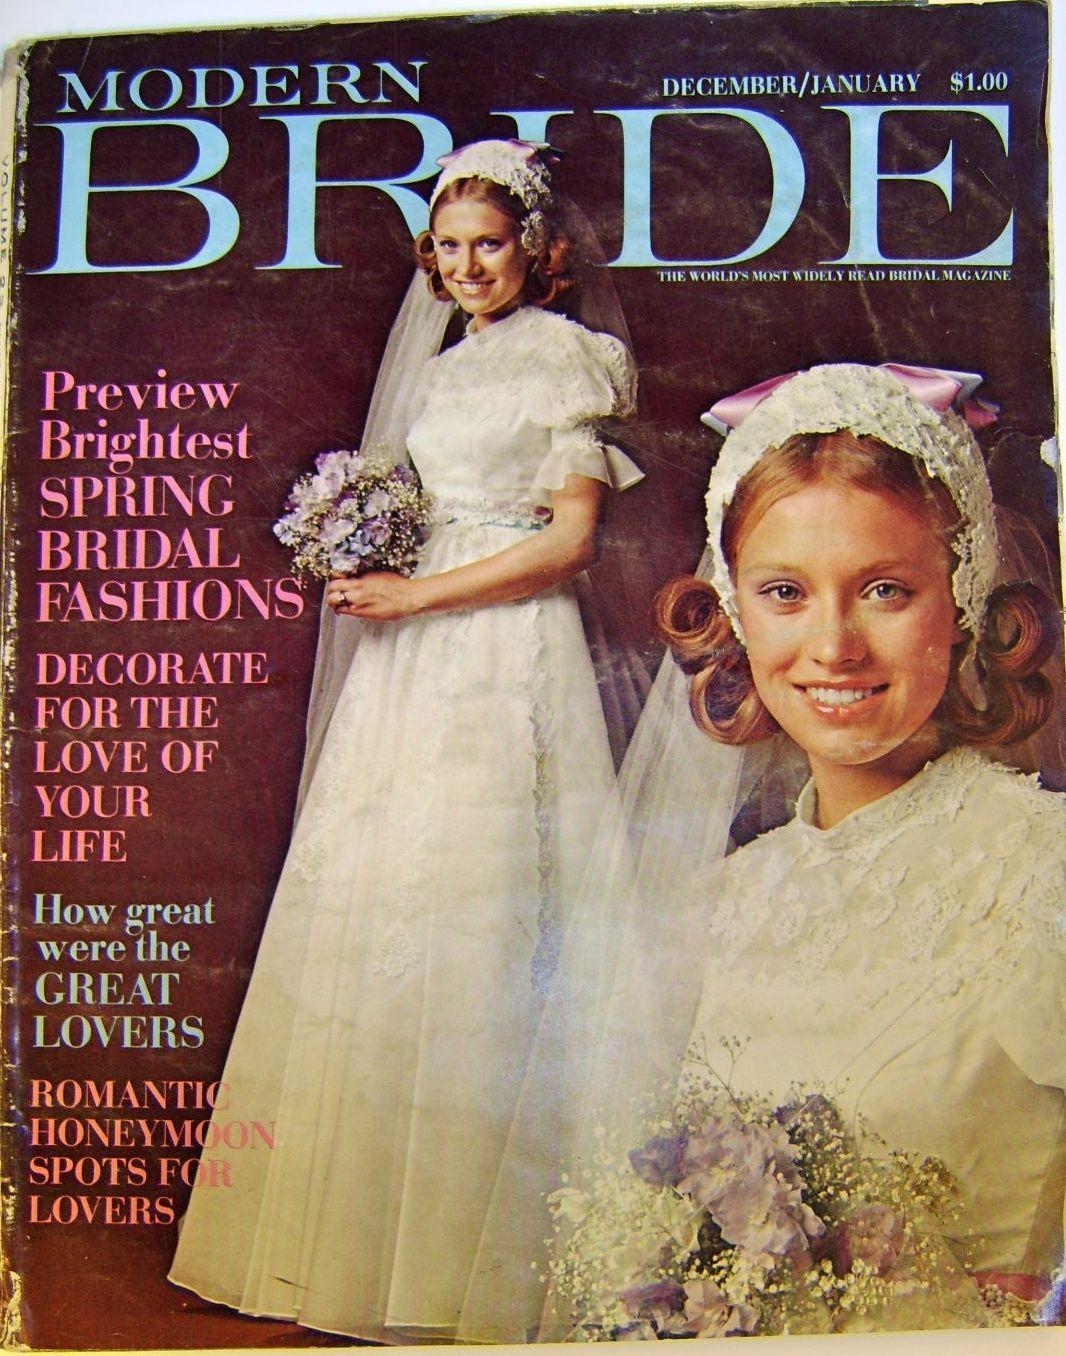 Modern Bride Vintage Magazine December 1971 and January